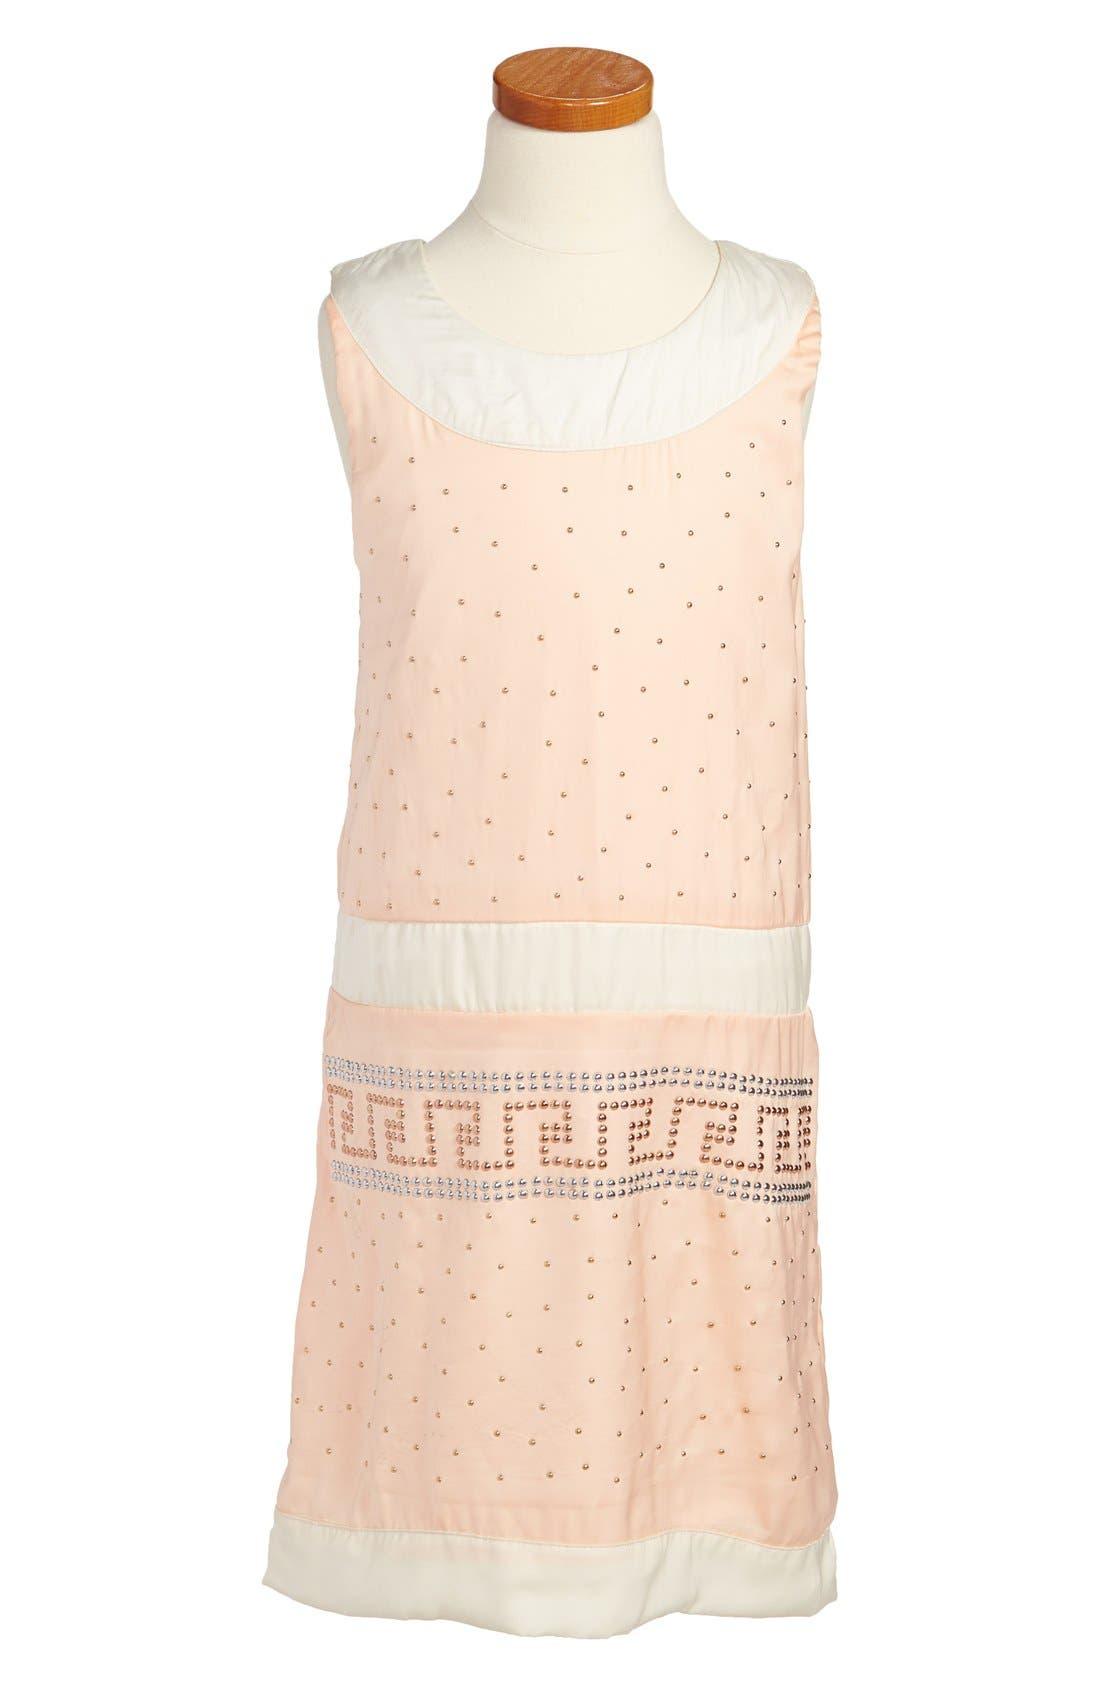 Main Image - Laundry by Shelli Segal 'Catherine' Sleeveless Studded Dress (Big Girls)